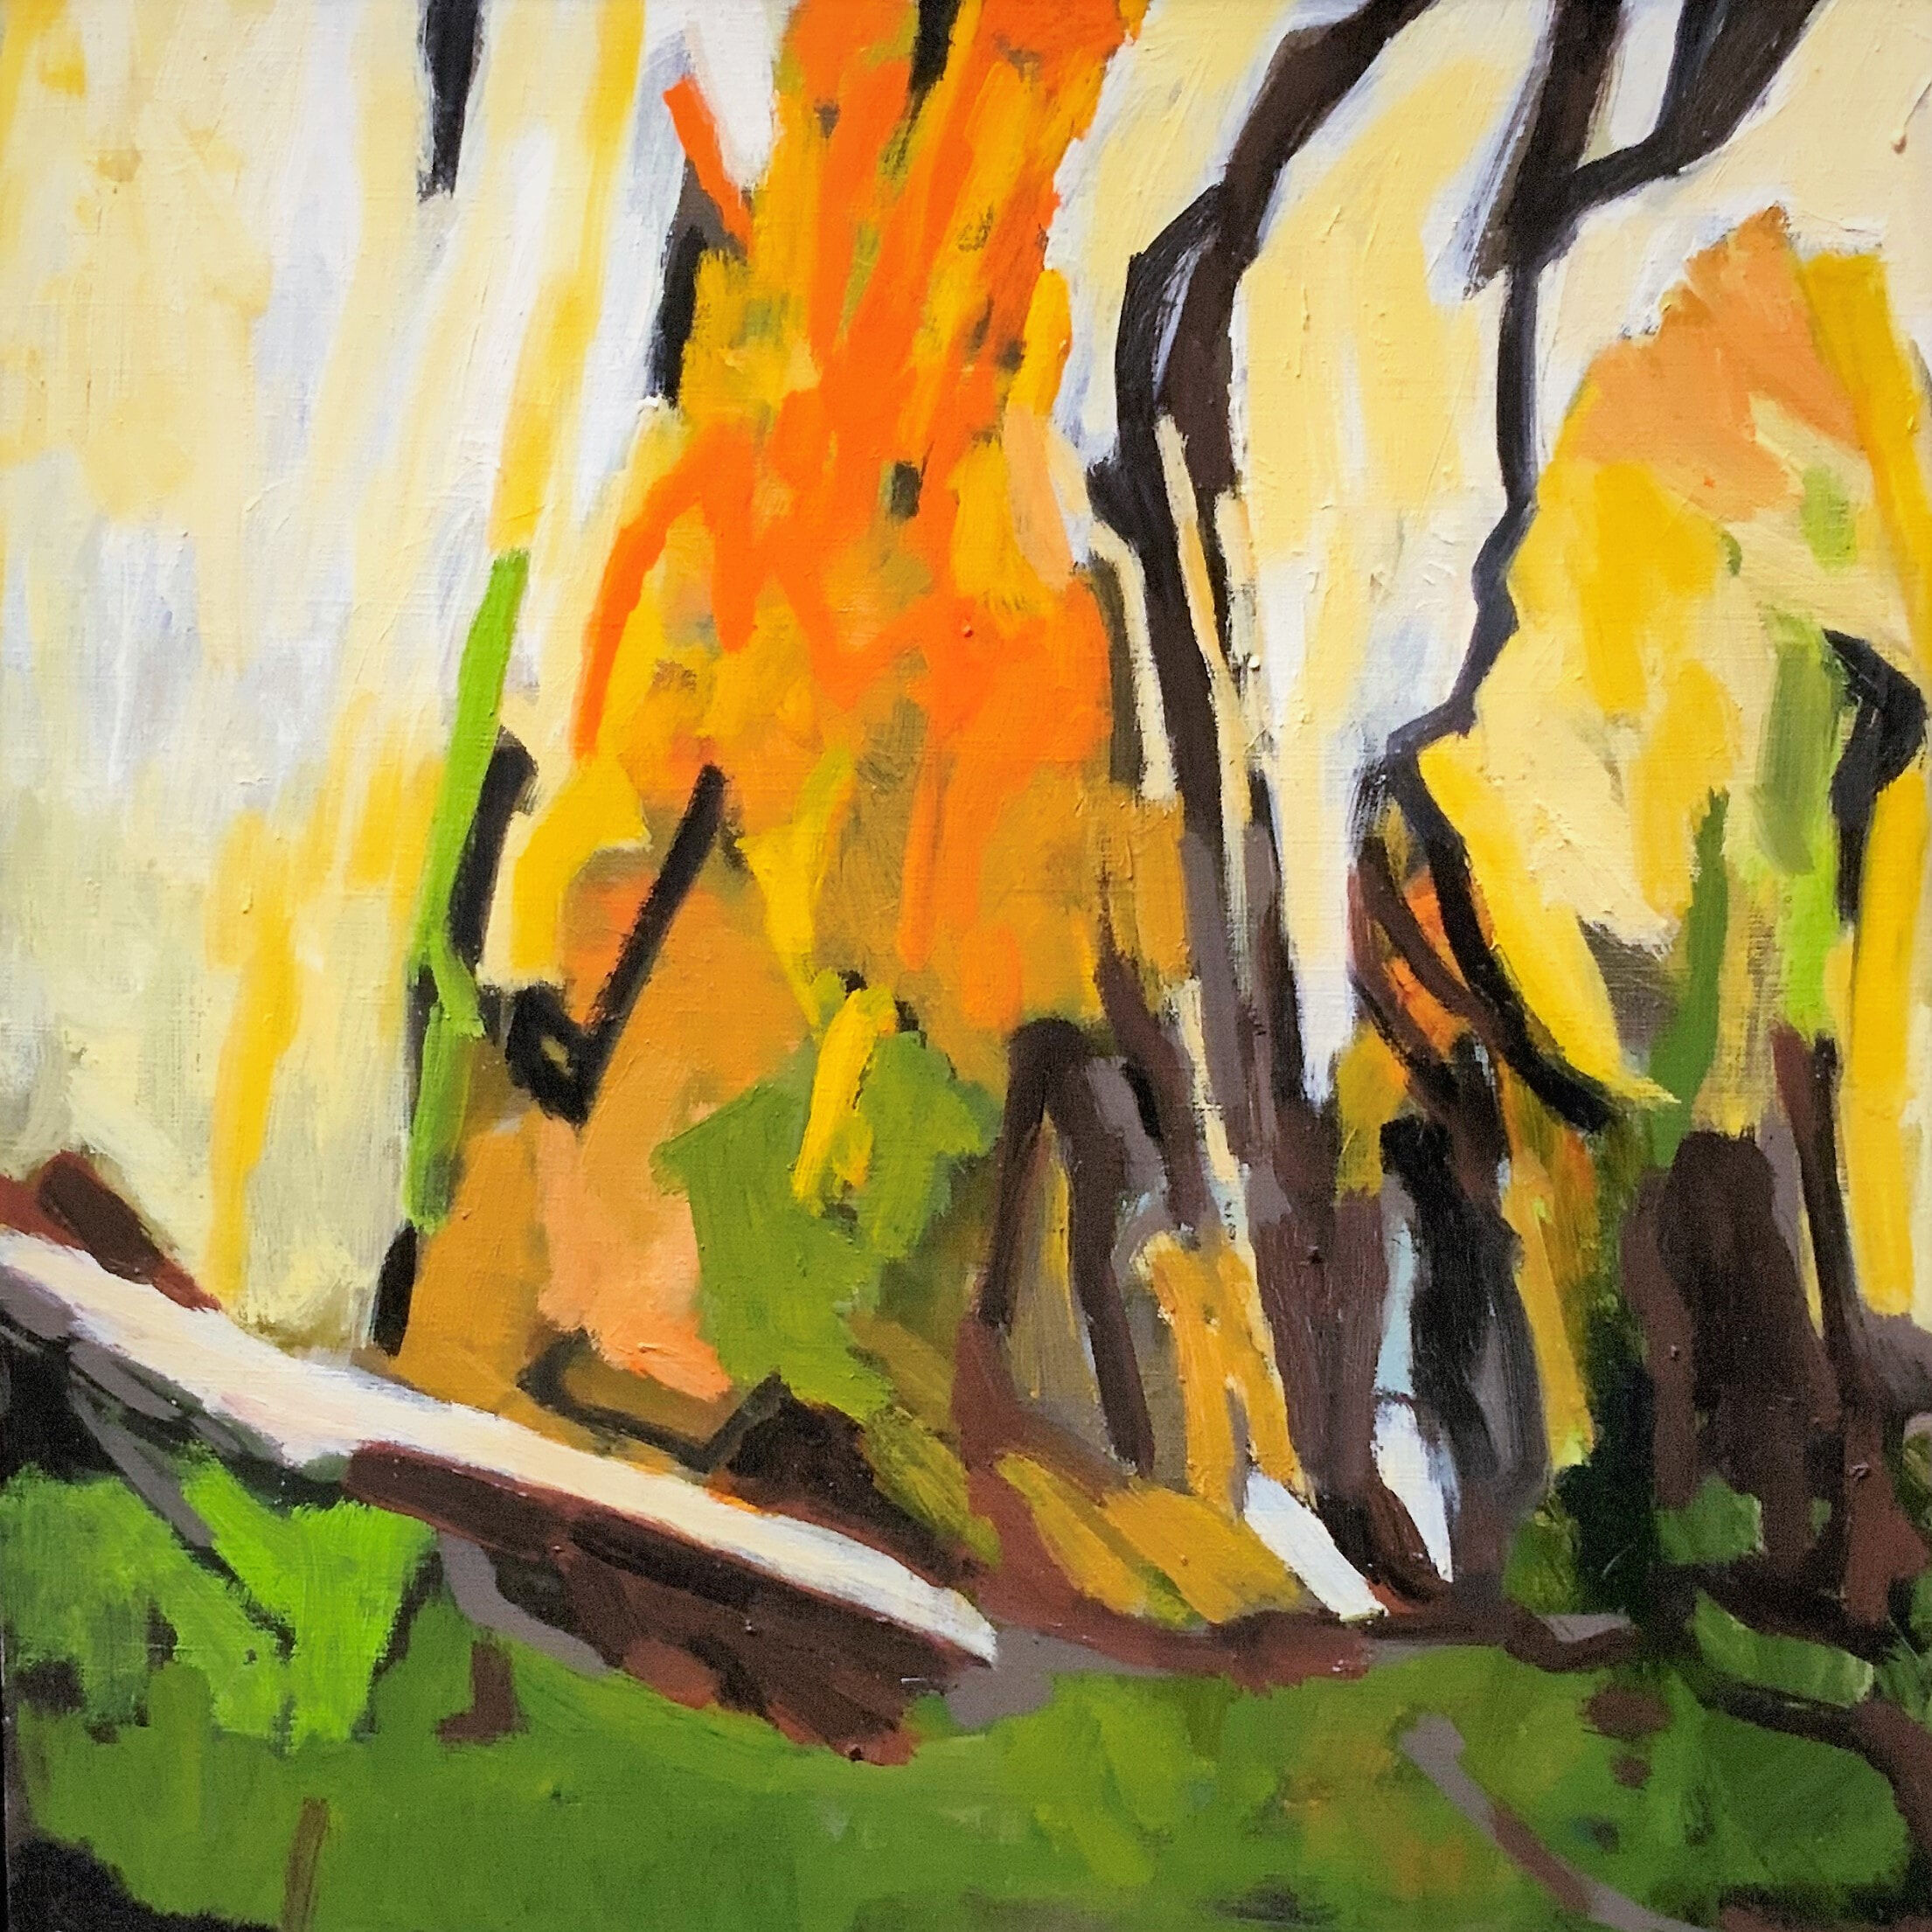 Pridham_Robyn Autumns End Oil on canvas 2019